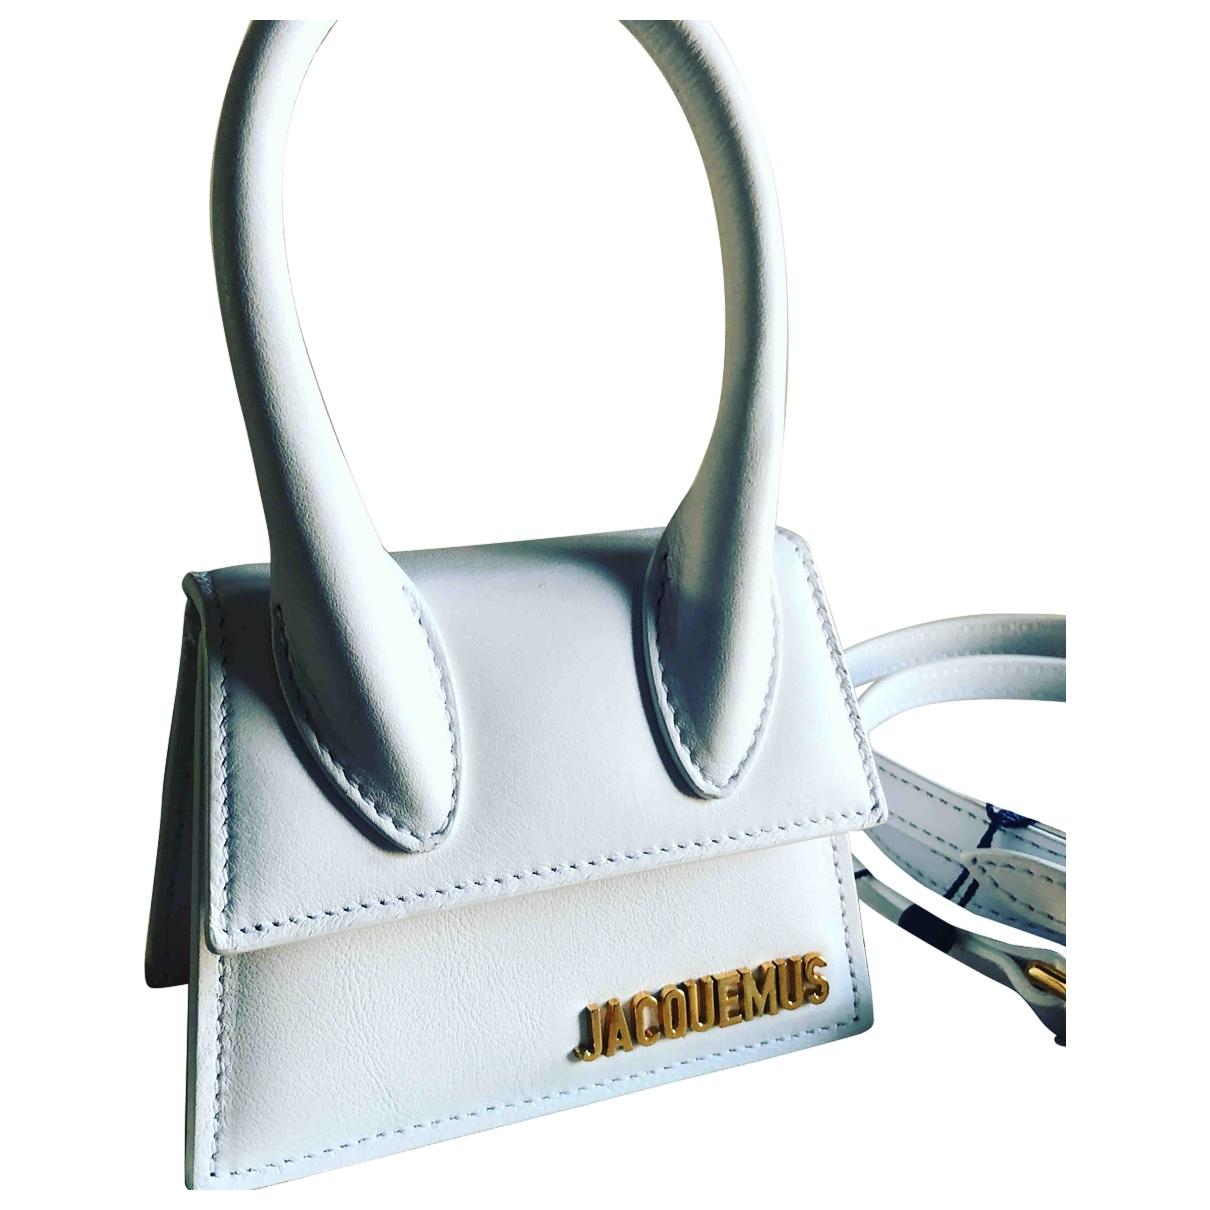 Jacquemus Chiquito White Leather handbag for Women \N